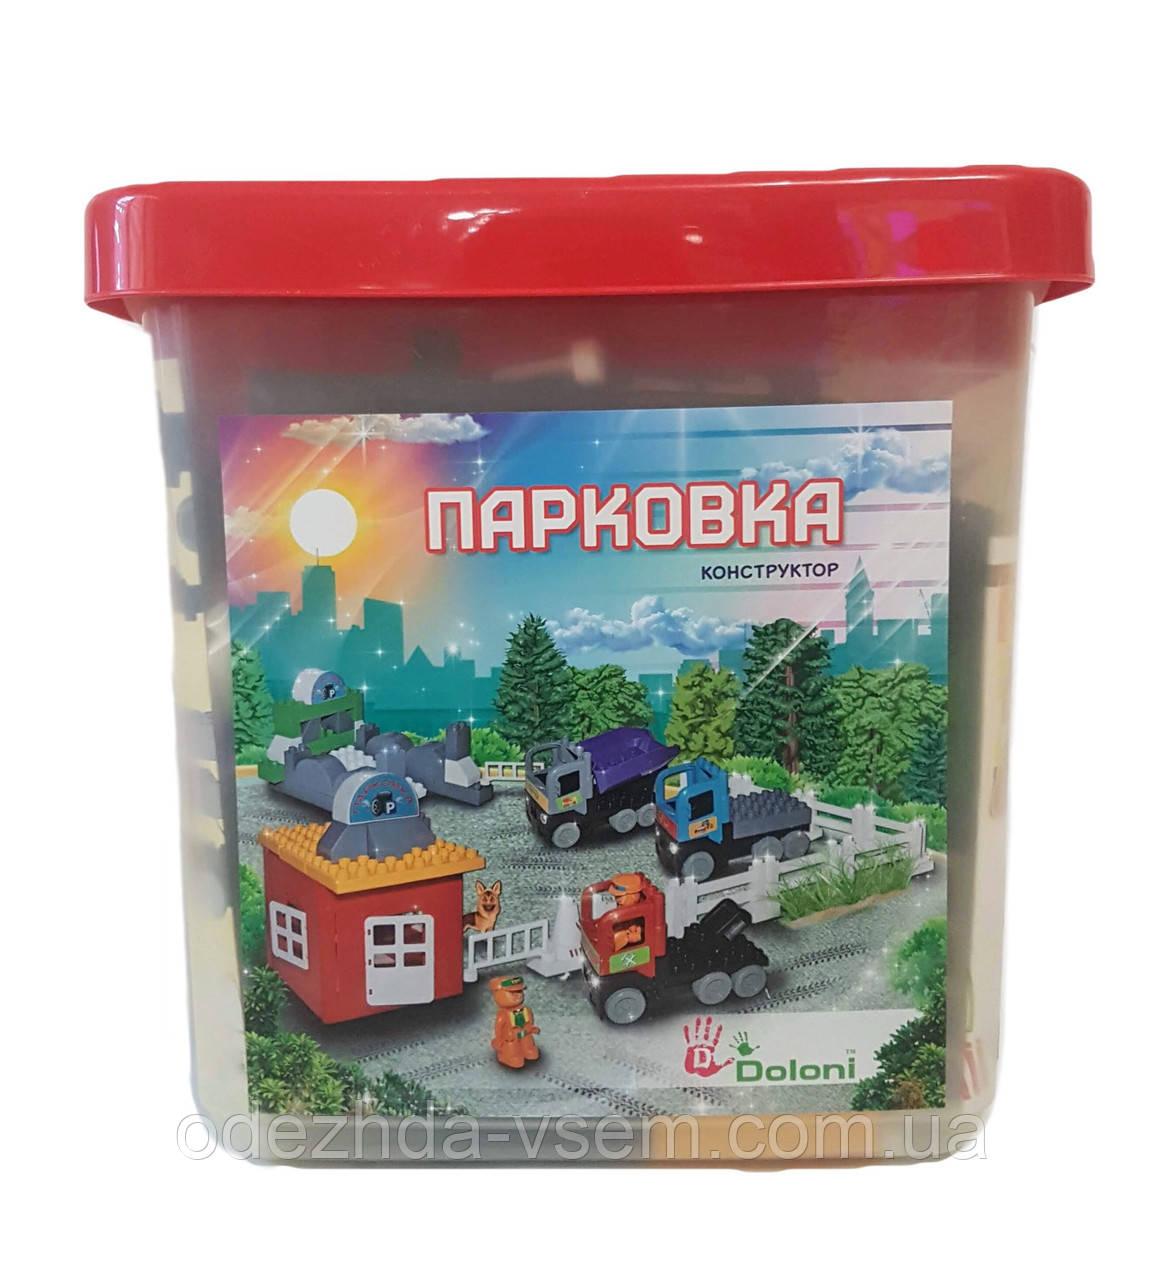 Конструктор Парковка 124 дет ( розмір Lego Duplo)